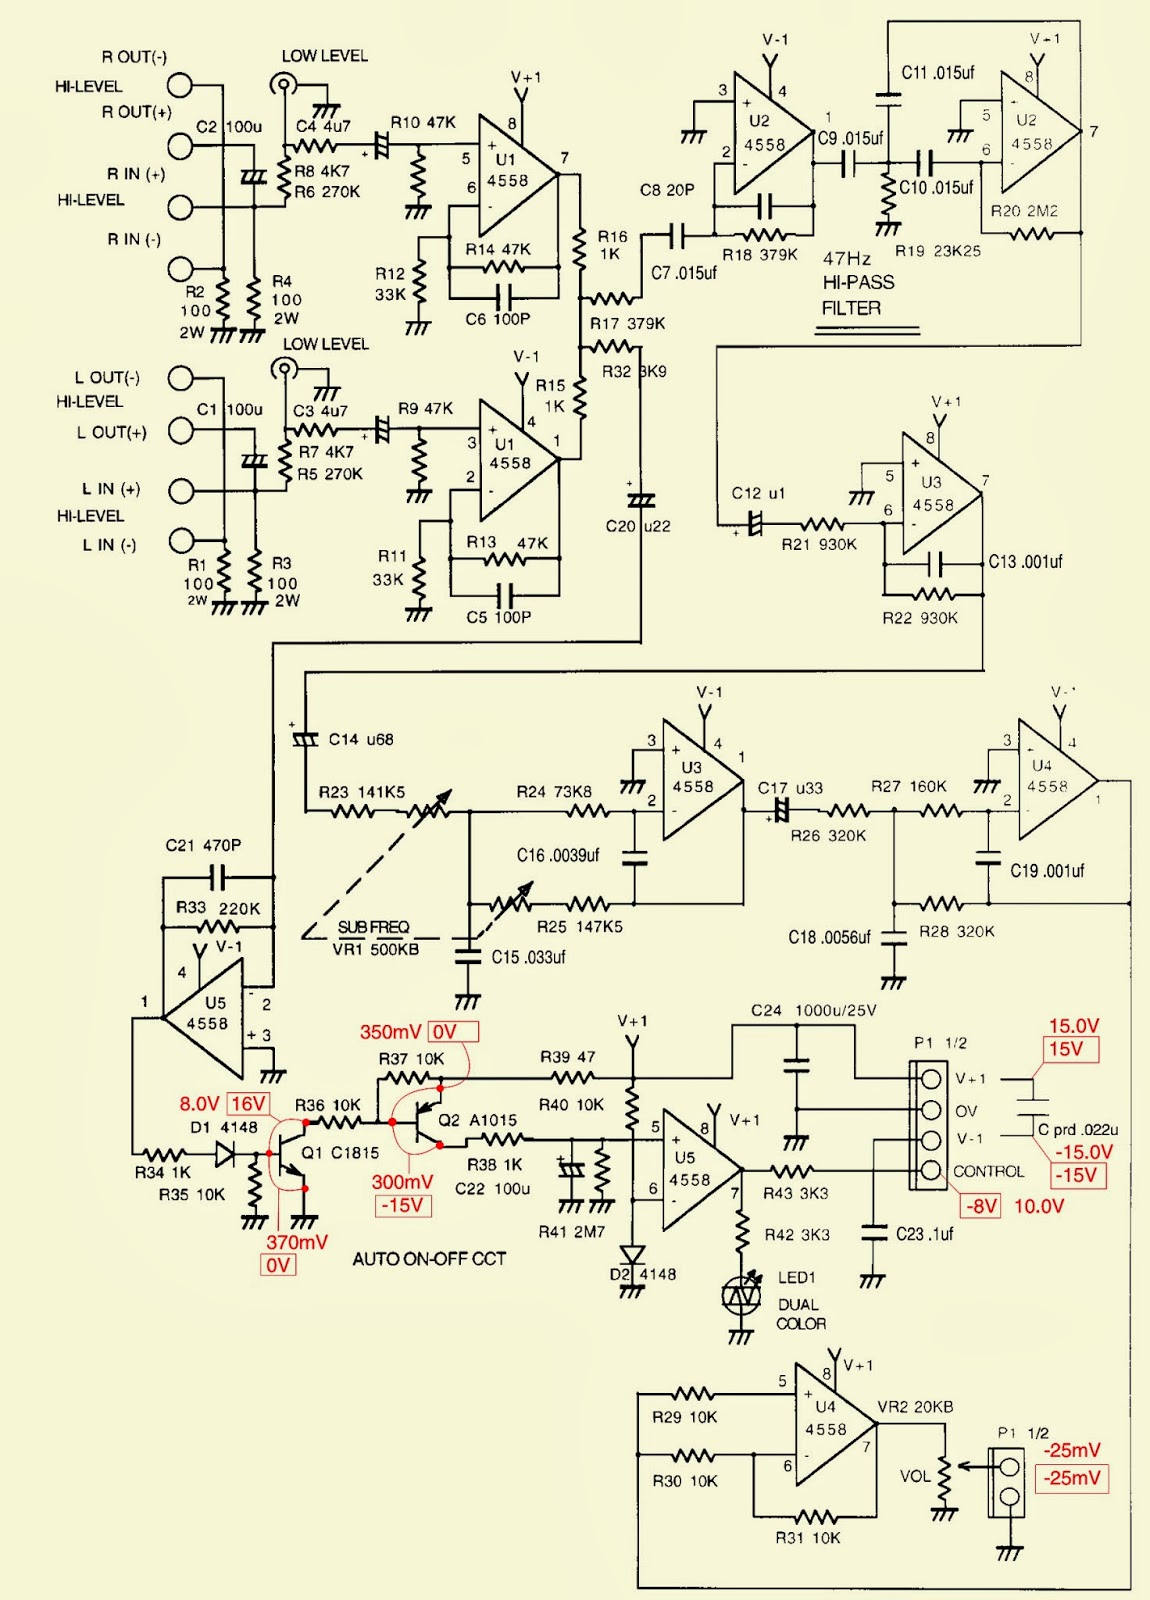 small resolution of jbl arc sub test procedure schematic diagram circuit diagram jbl arc sub test procedure schematic diagram circuit diagram